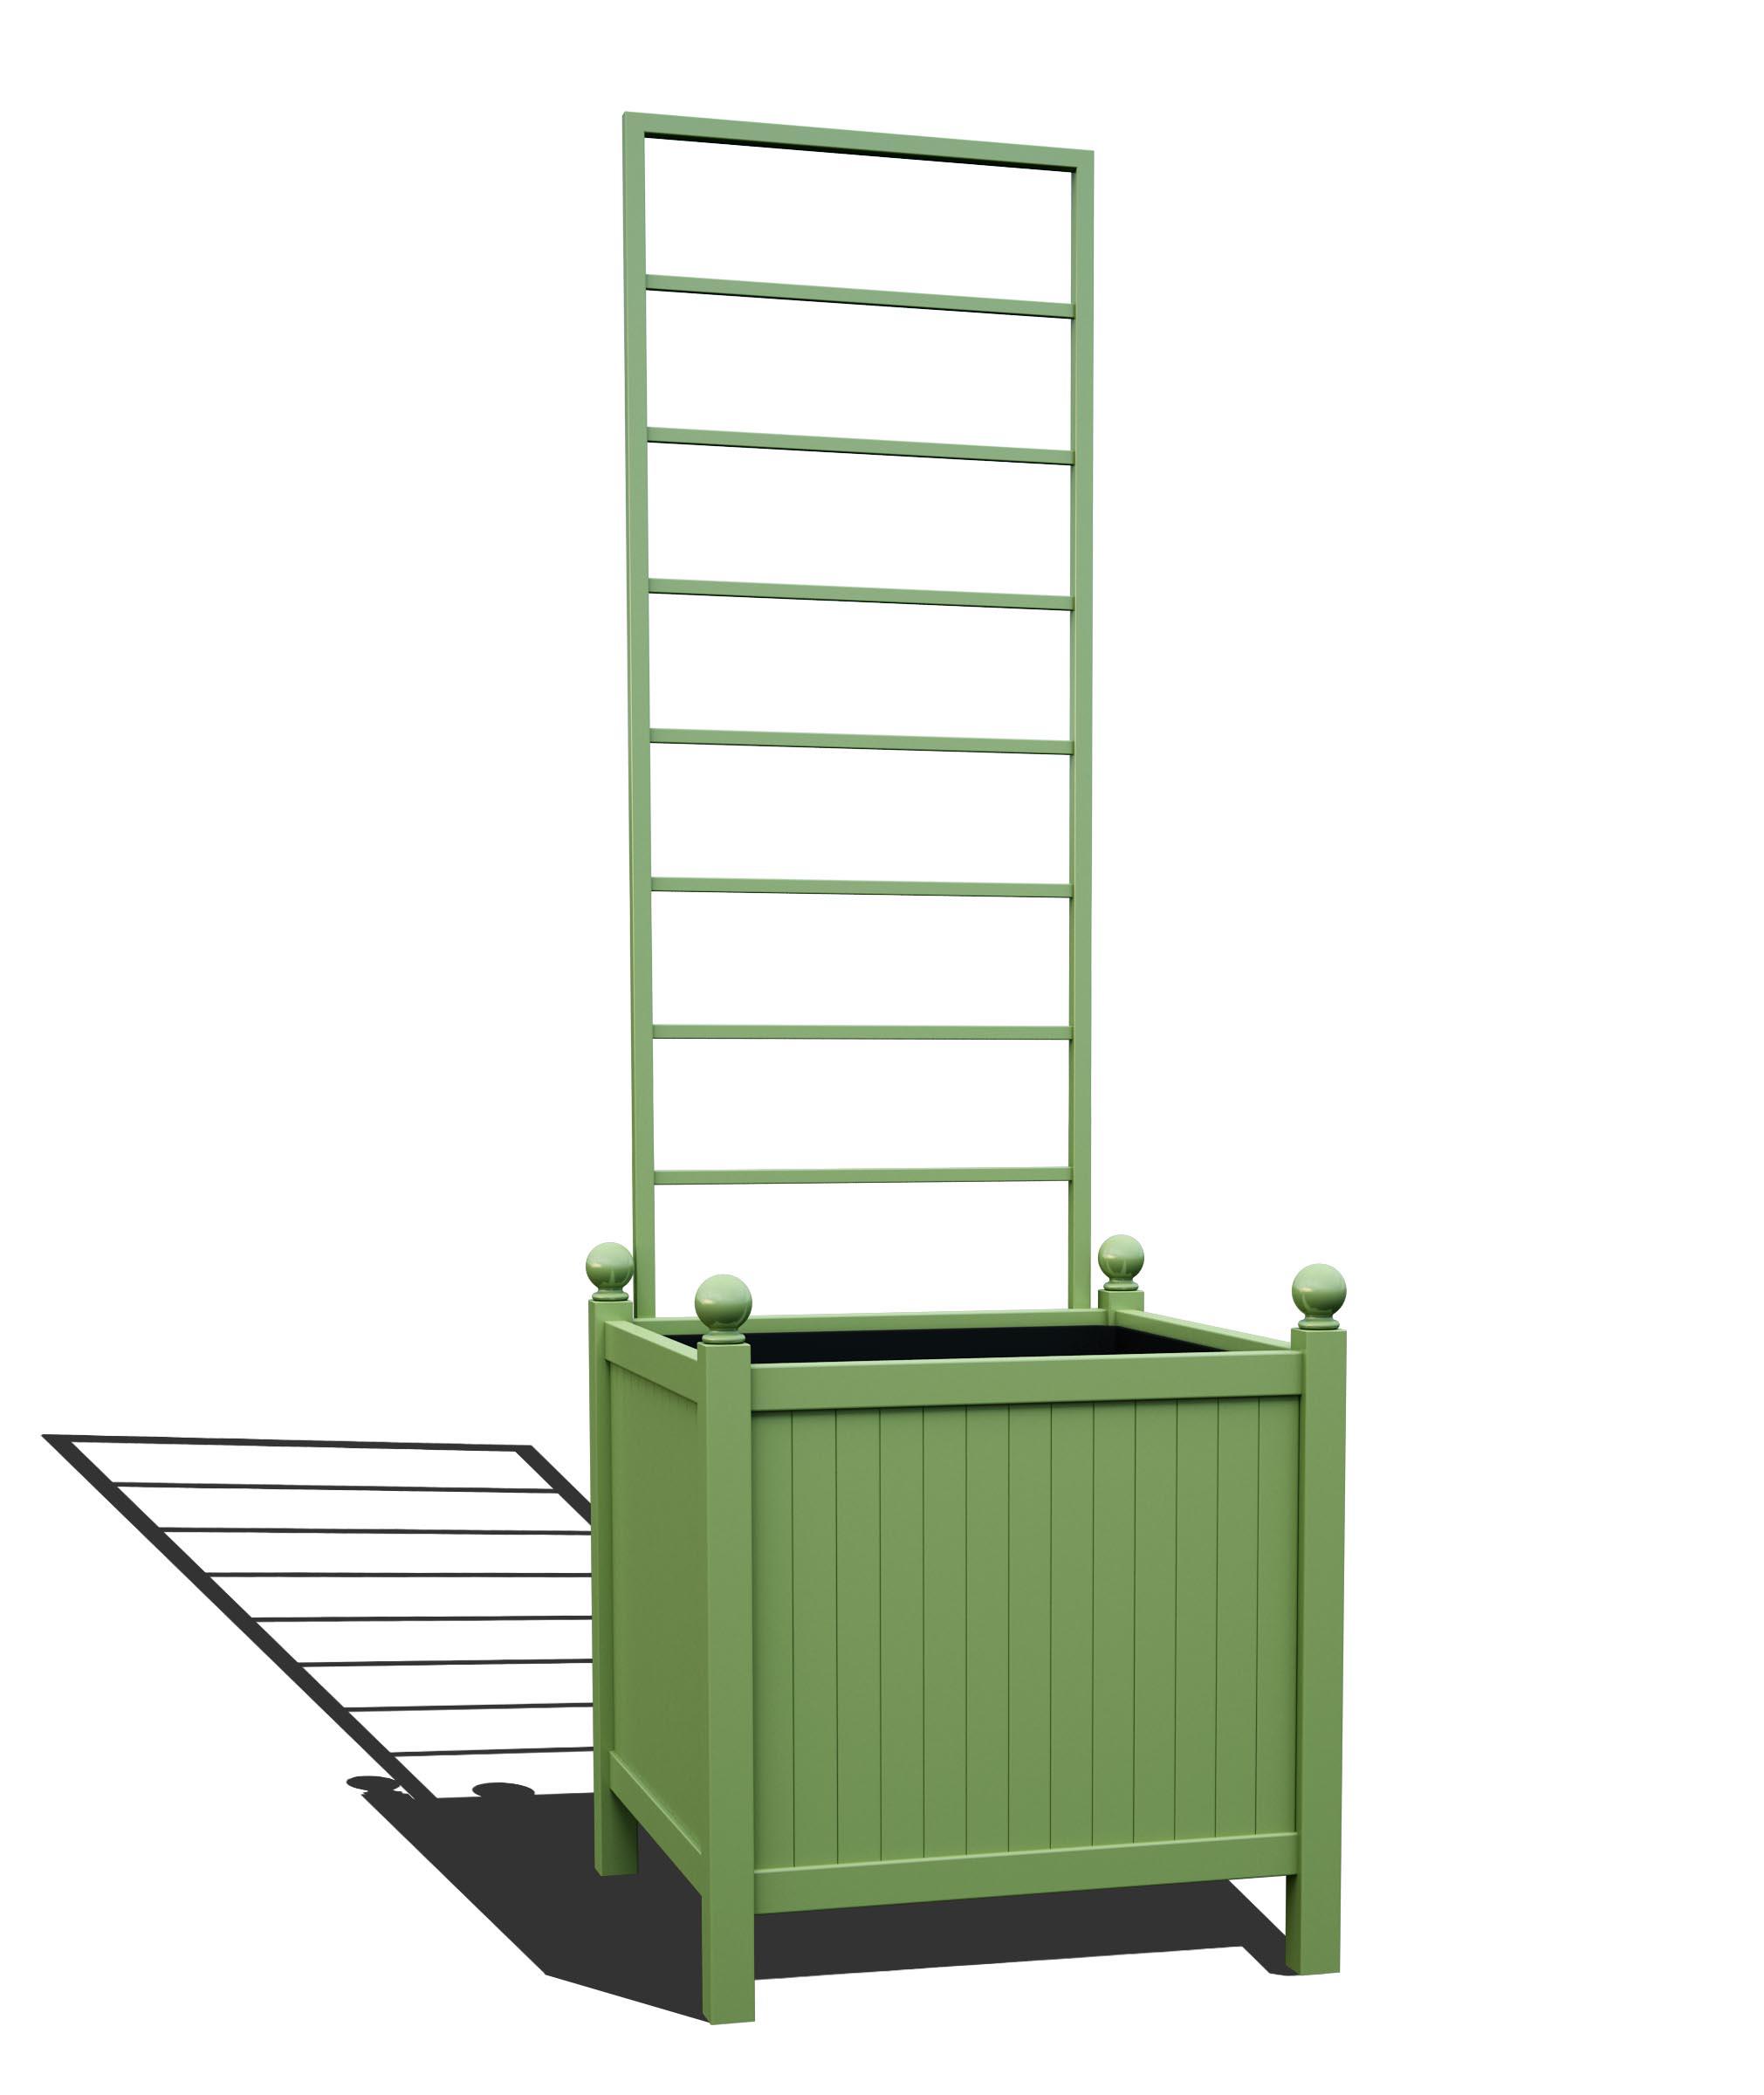 R24-Y-LLD-Versailler Park Metall Pflanzkübel mit abnehmbaren Rankgitter in RAL 6021 pale green